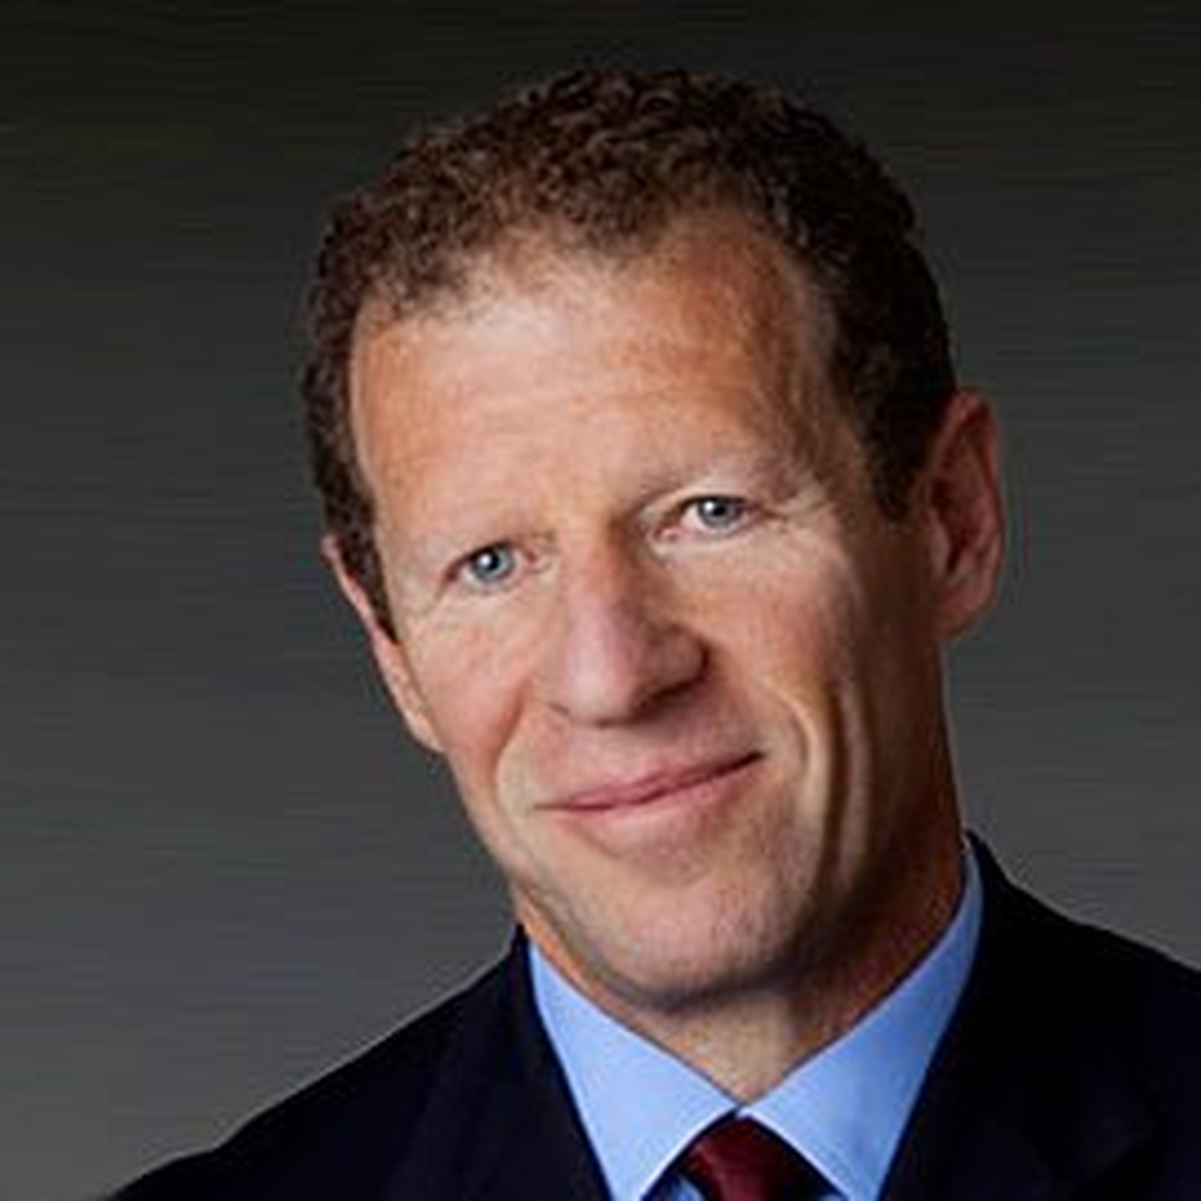 Stephen L. Weiss